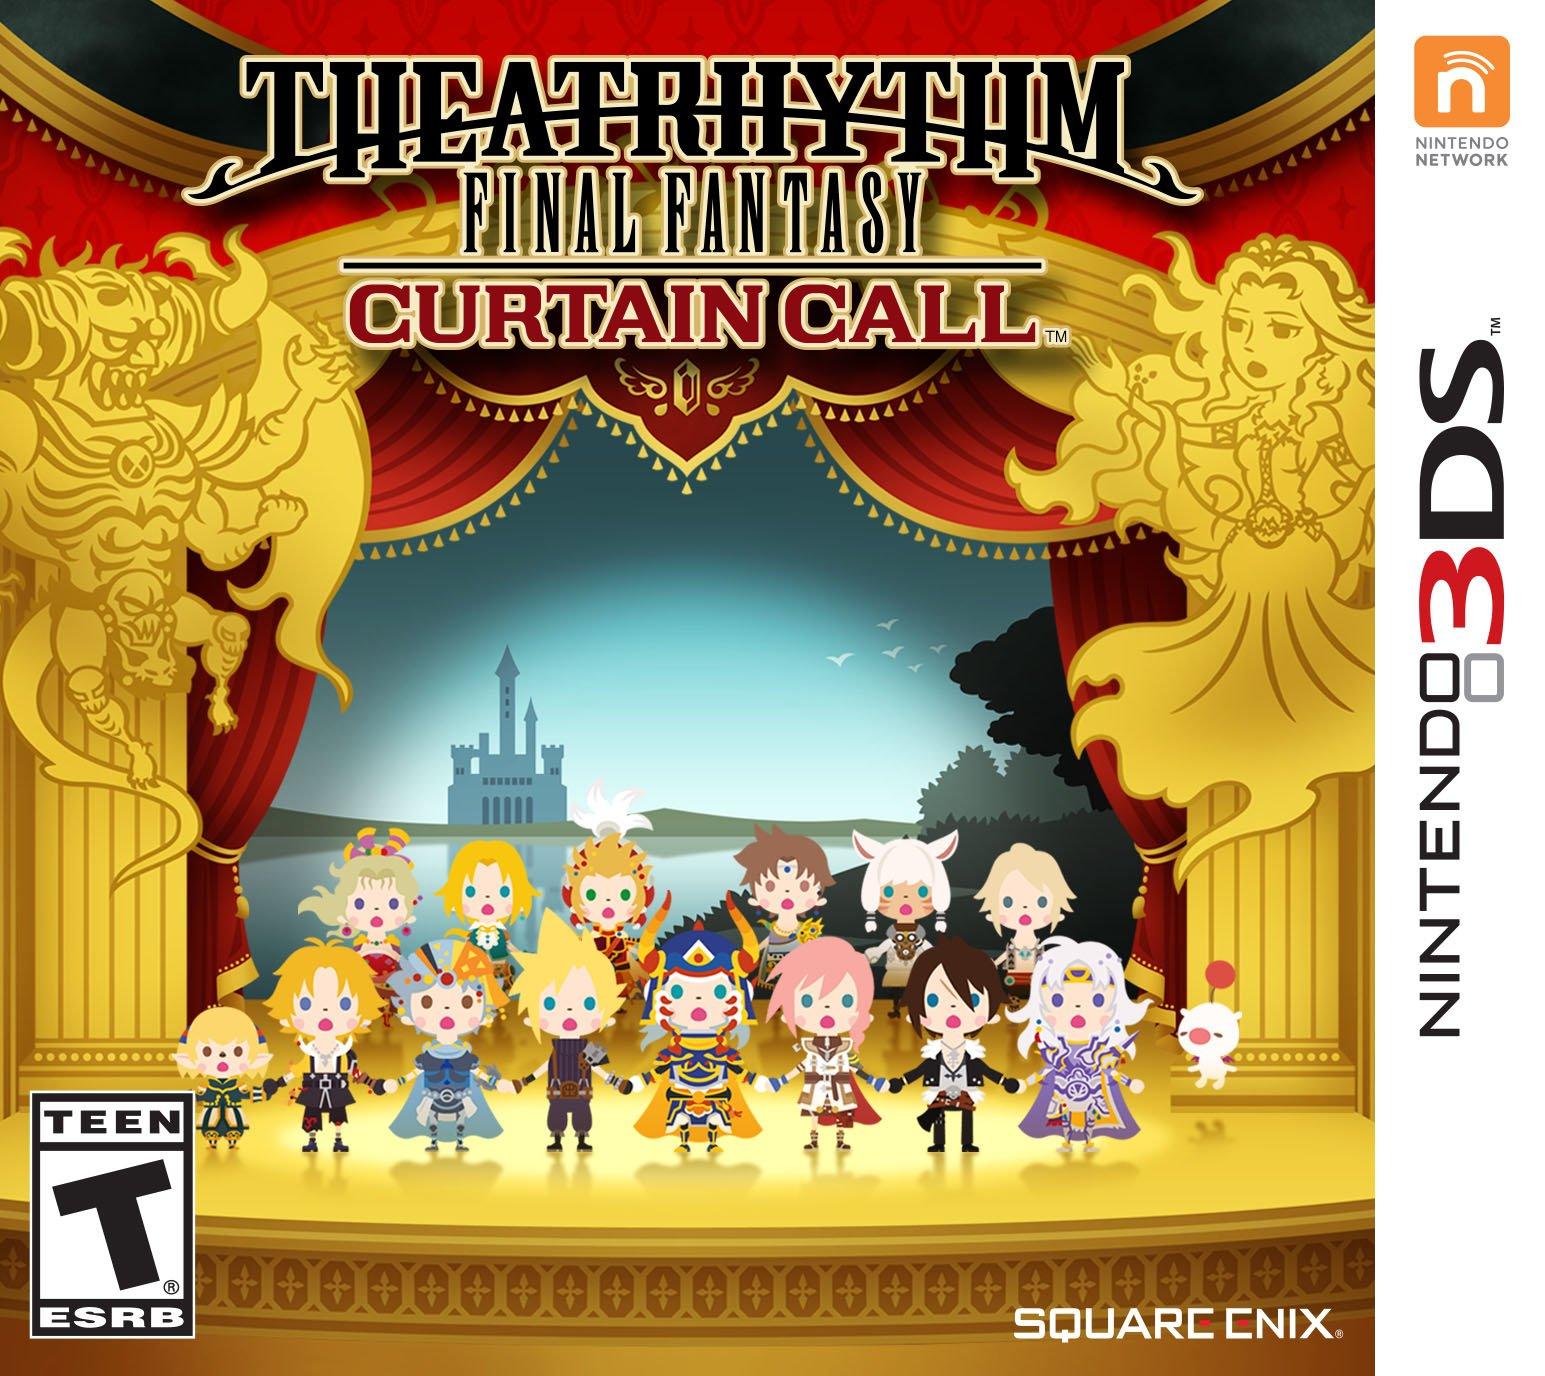 Theatrhythm Final Fantasy: Curtain Call (3DS) Review 2